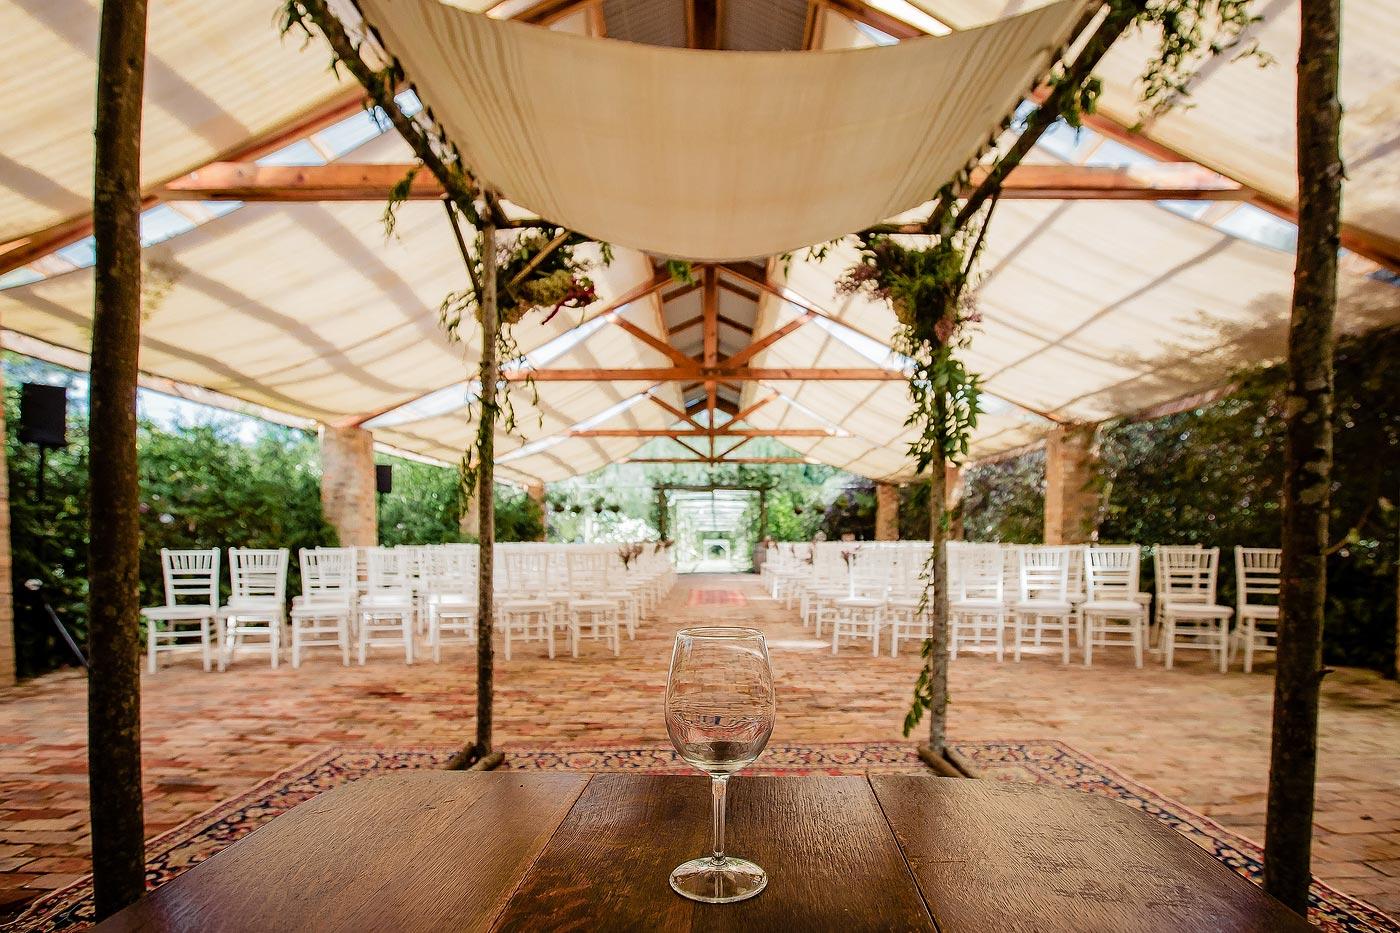 Jewish Wedding Chuppah Ceremony Decor with wine glass